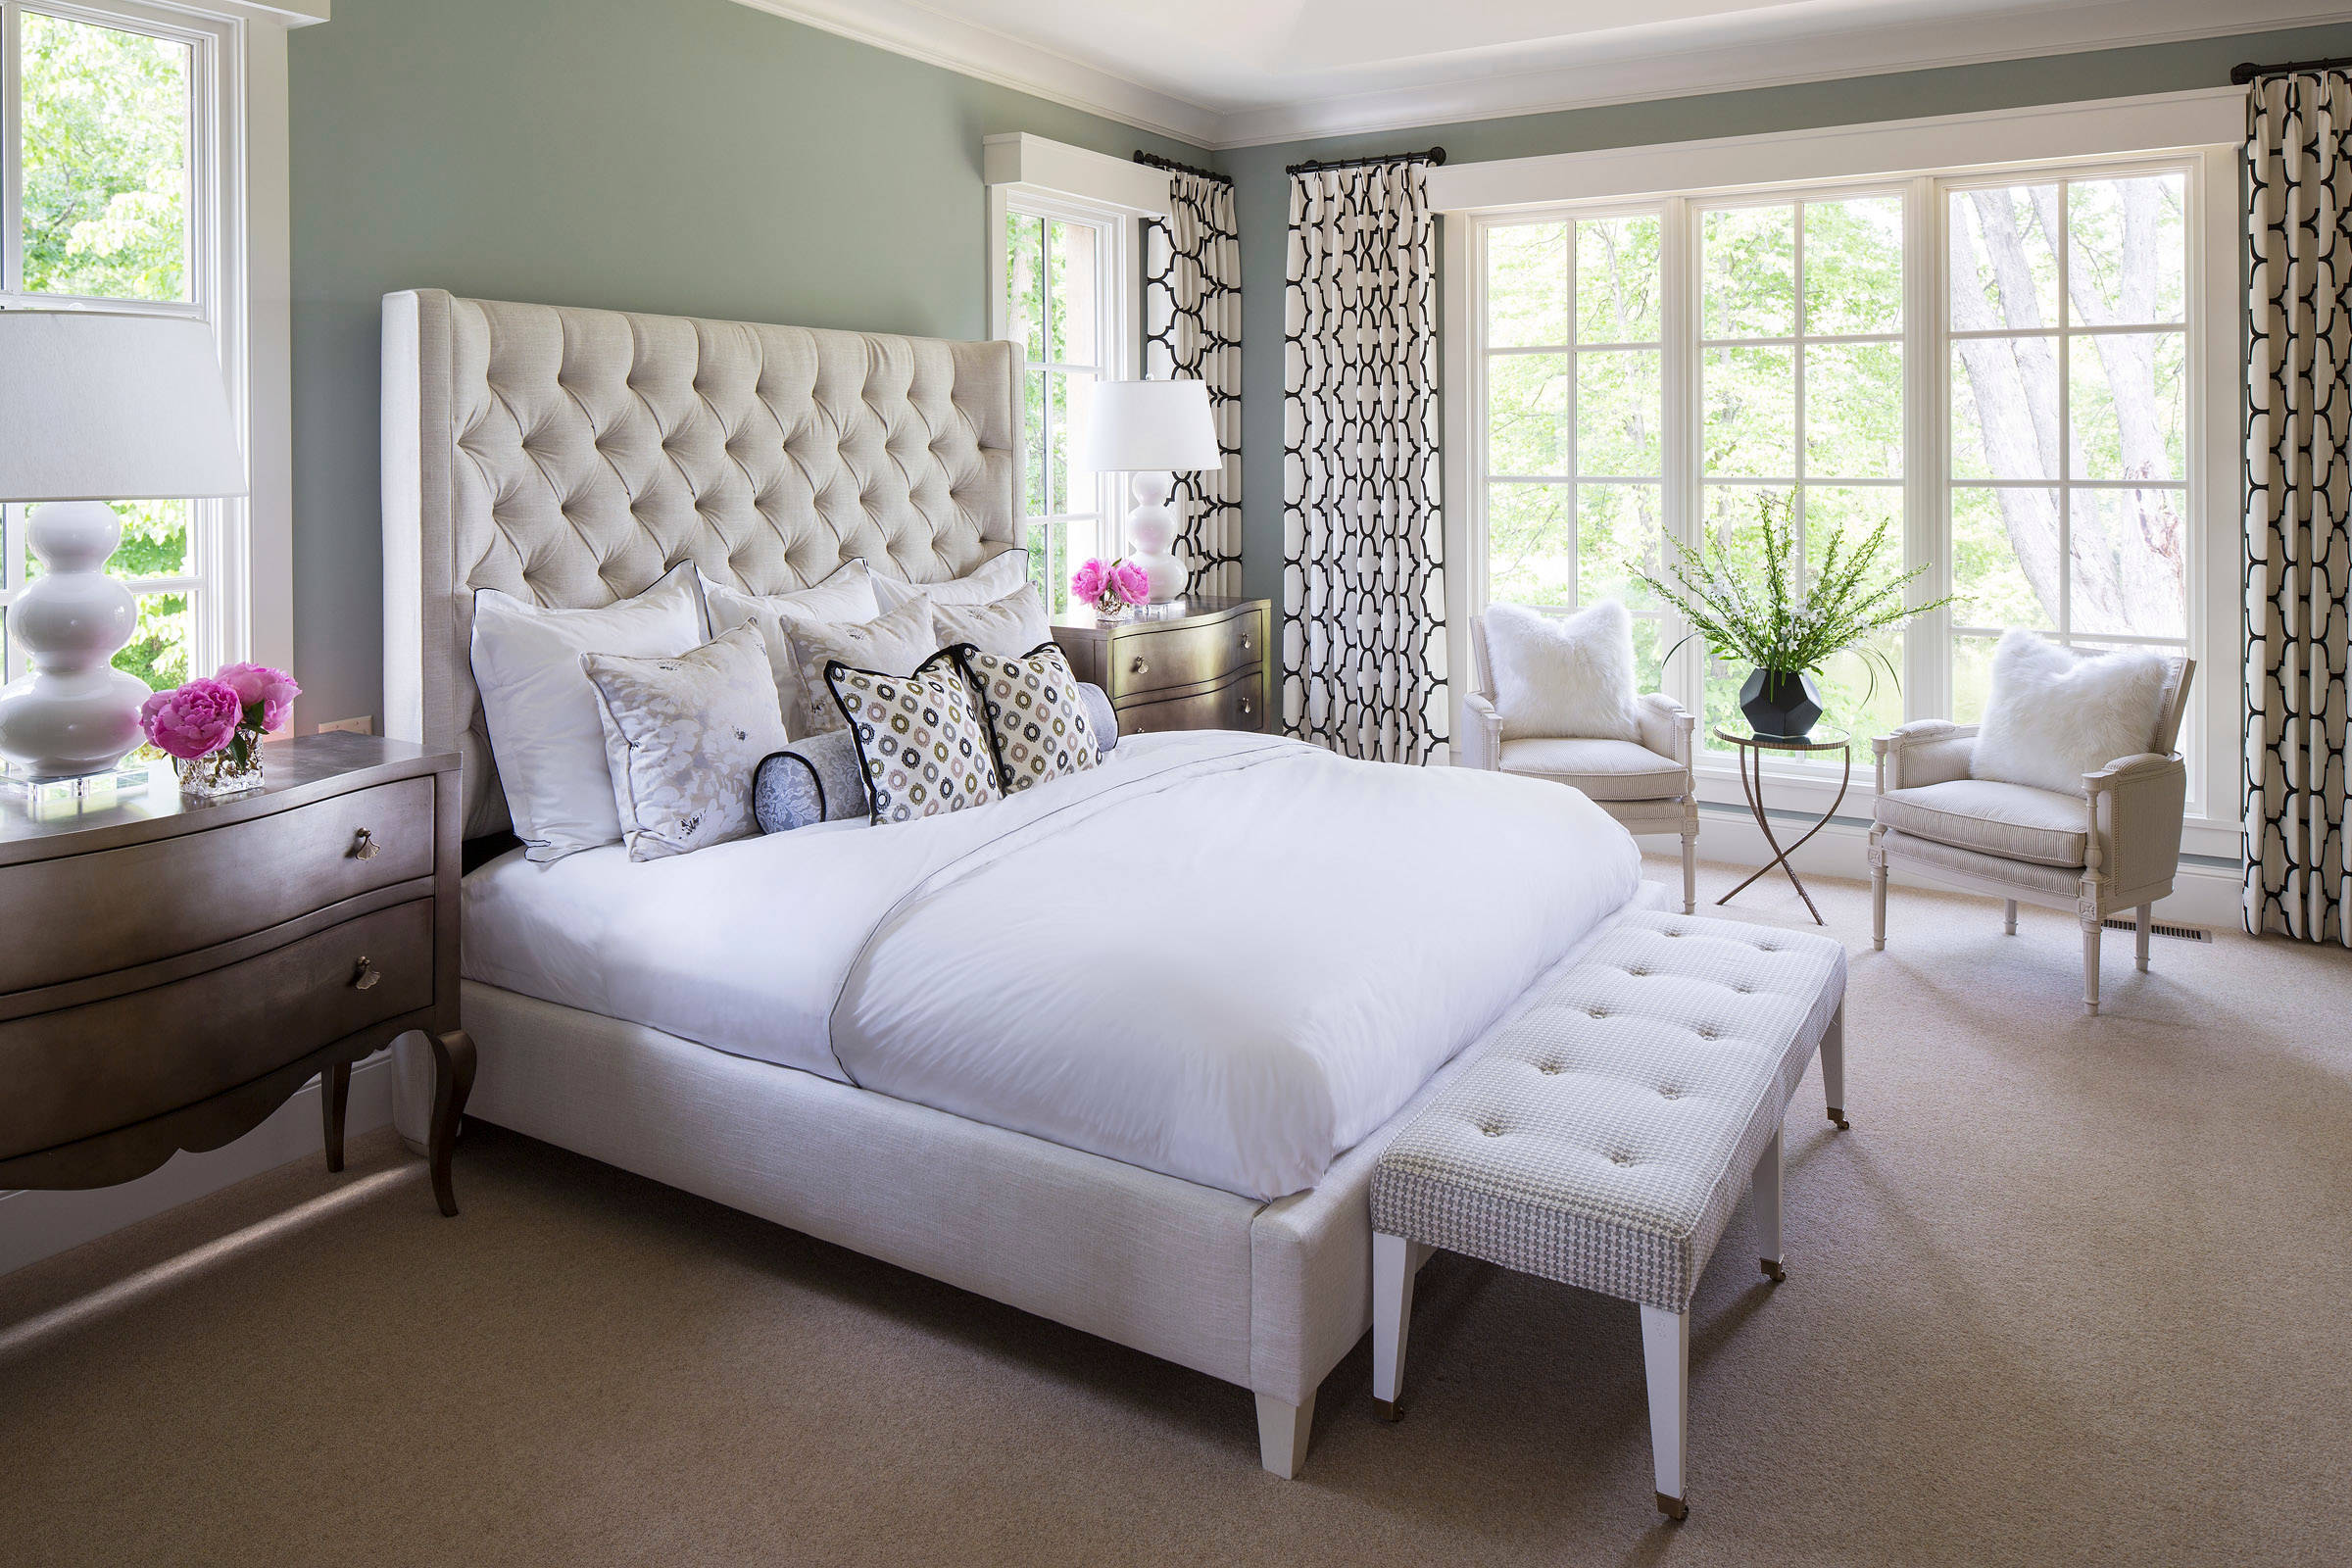 15x16 bedroom ideas and photos | houzz